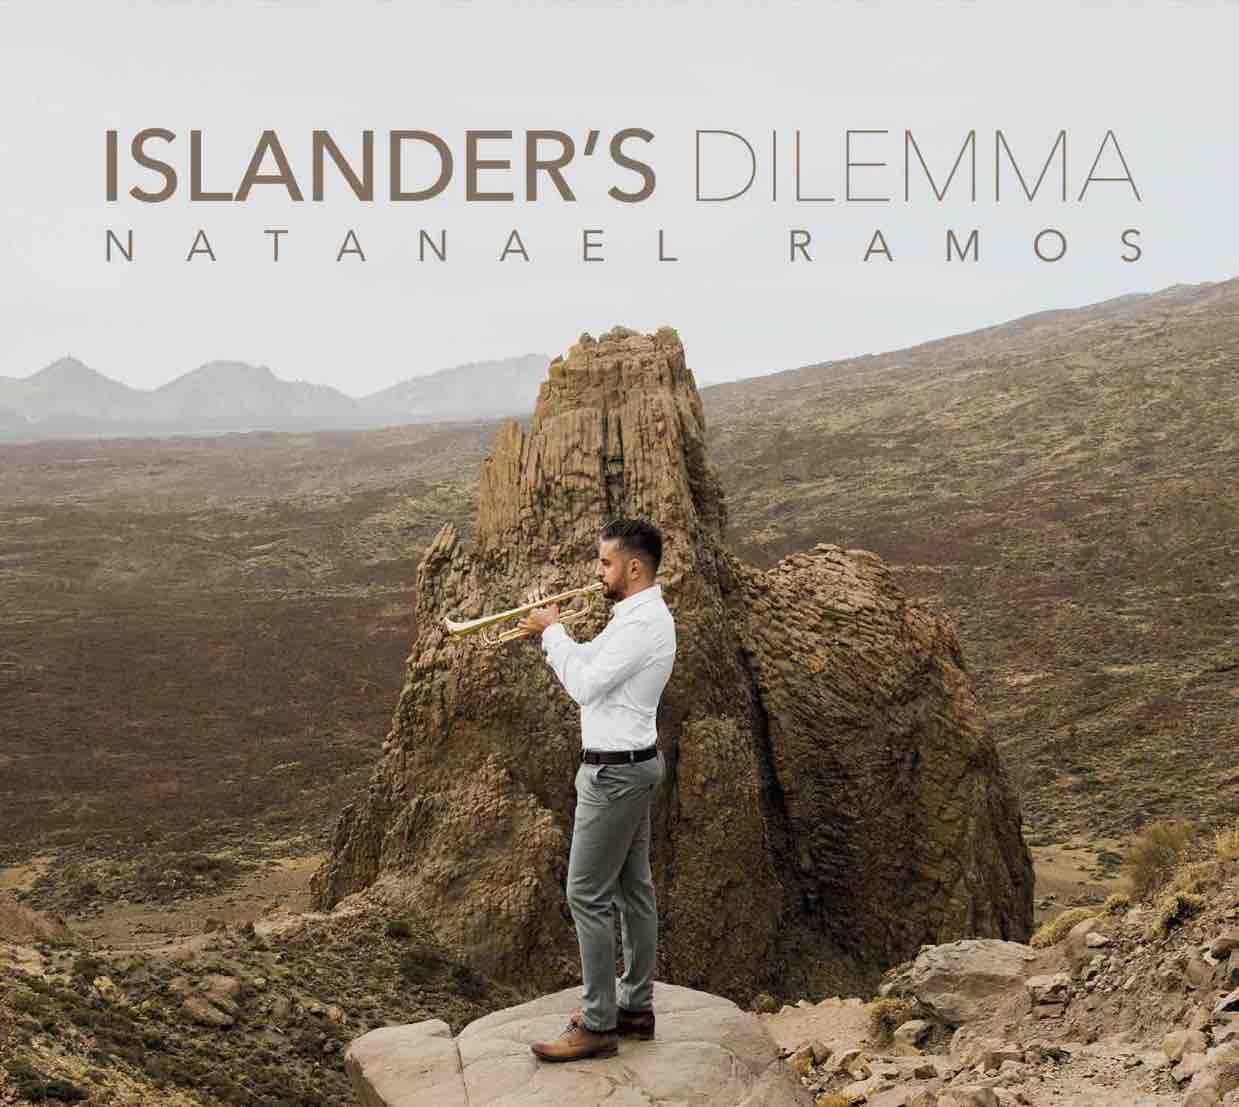 ISLANDER'S DILEMMA